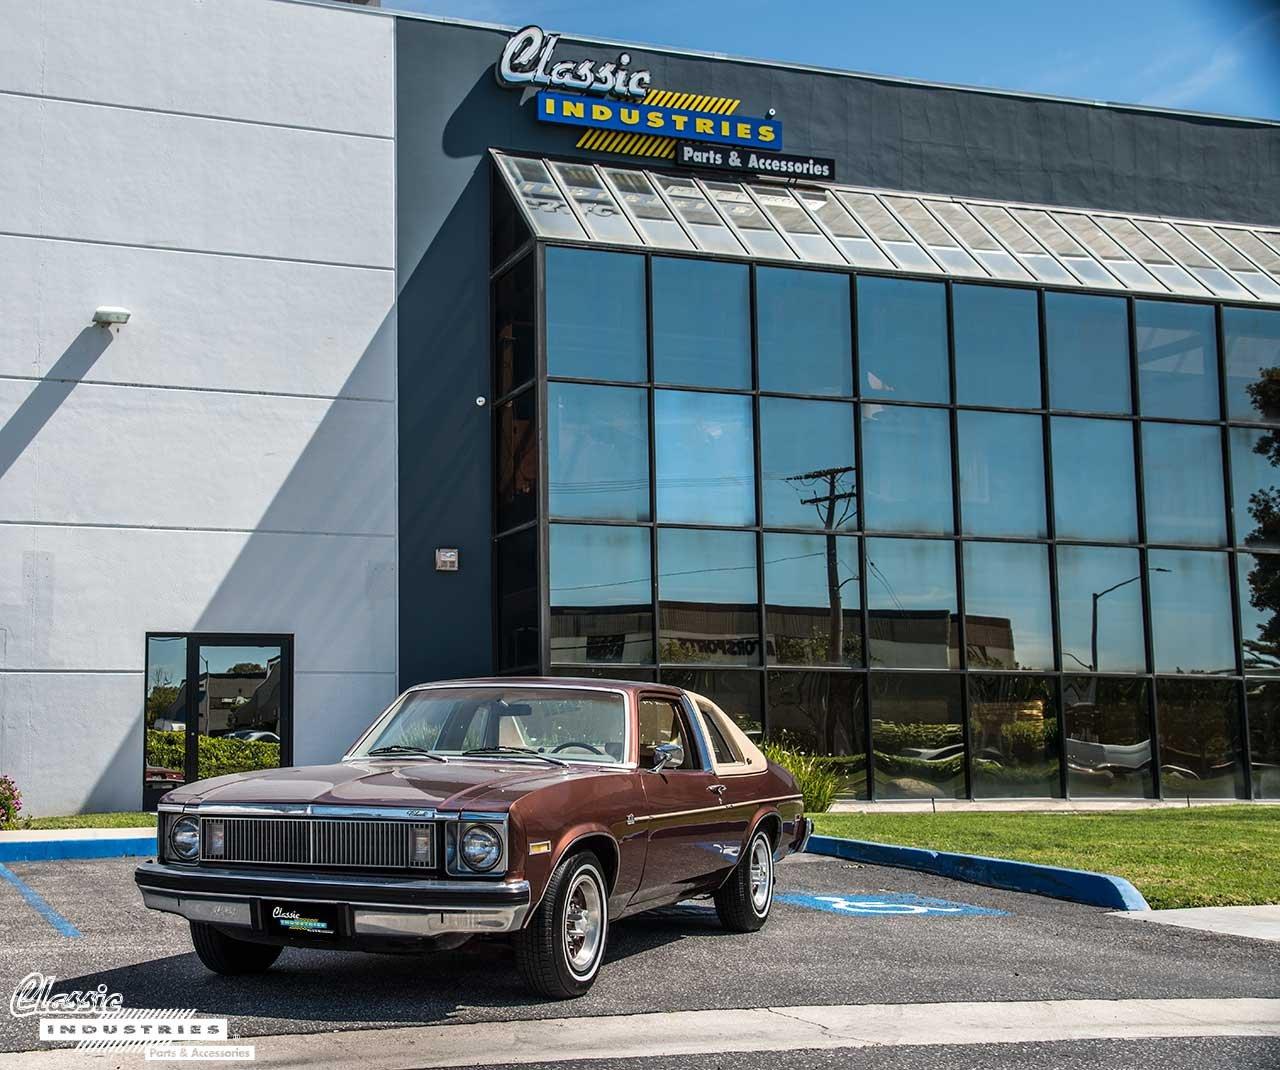 1978 Nova Custom - Cruising in Style